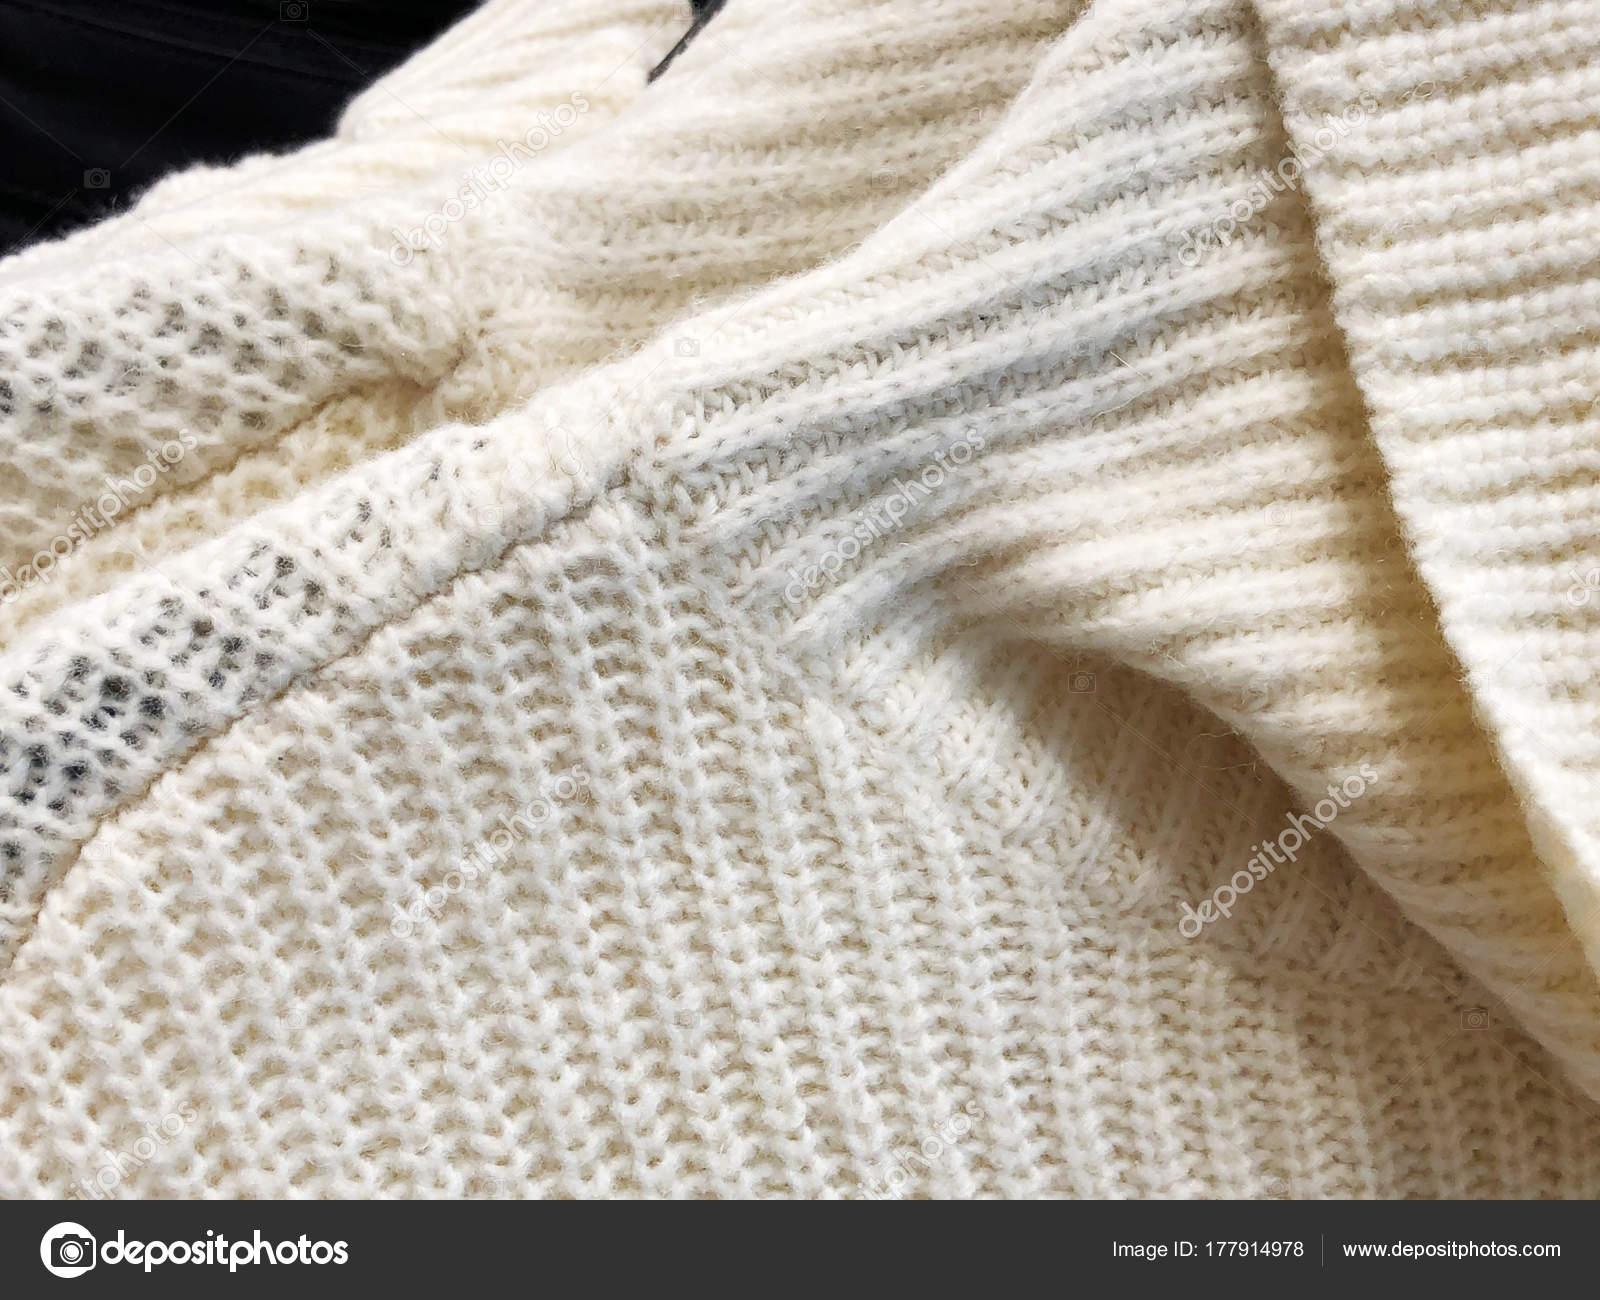 eac804cb0d Γυναικεία πουλόβερ σε κρεμάστρα στην αποθήκη. Ρούχα που κρέμονται σε ένα  ράφι σε ένα κατάστημα ρούχων — Εικόνα από ...